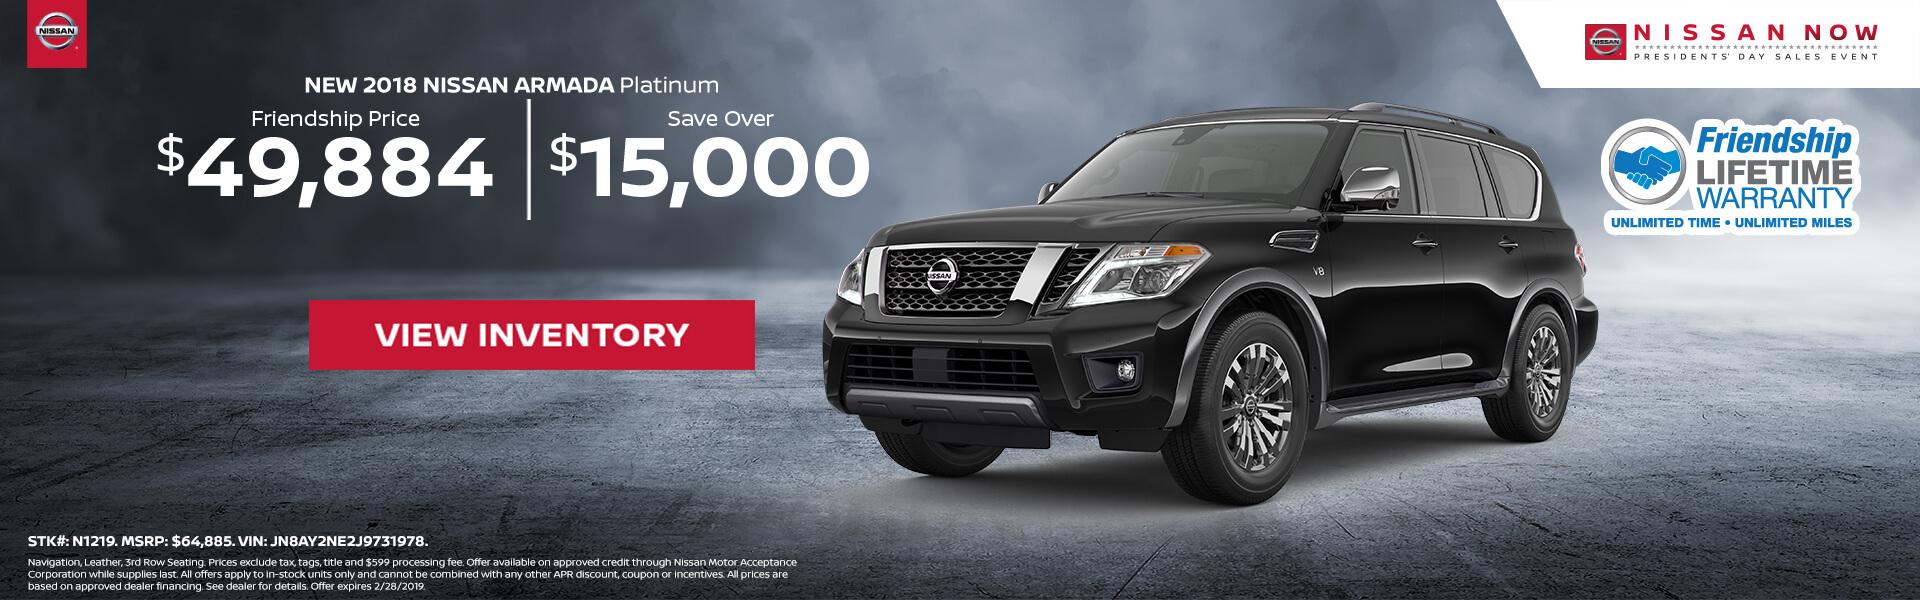 Nissan Armada $49,884 Purchase